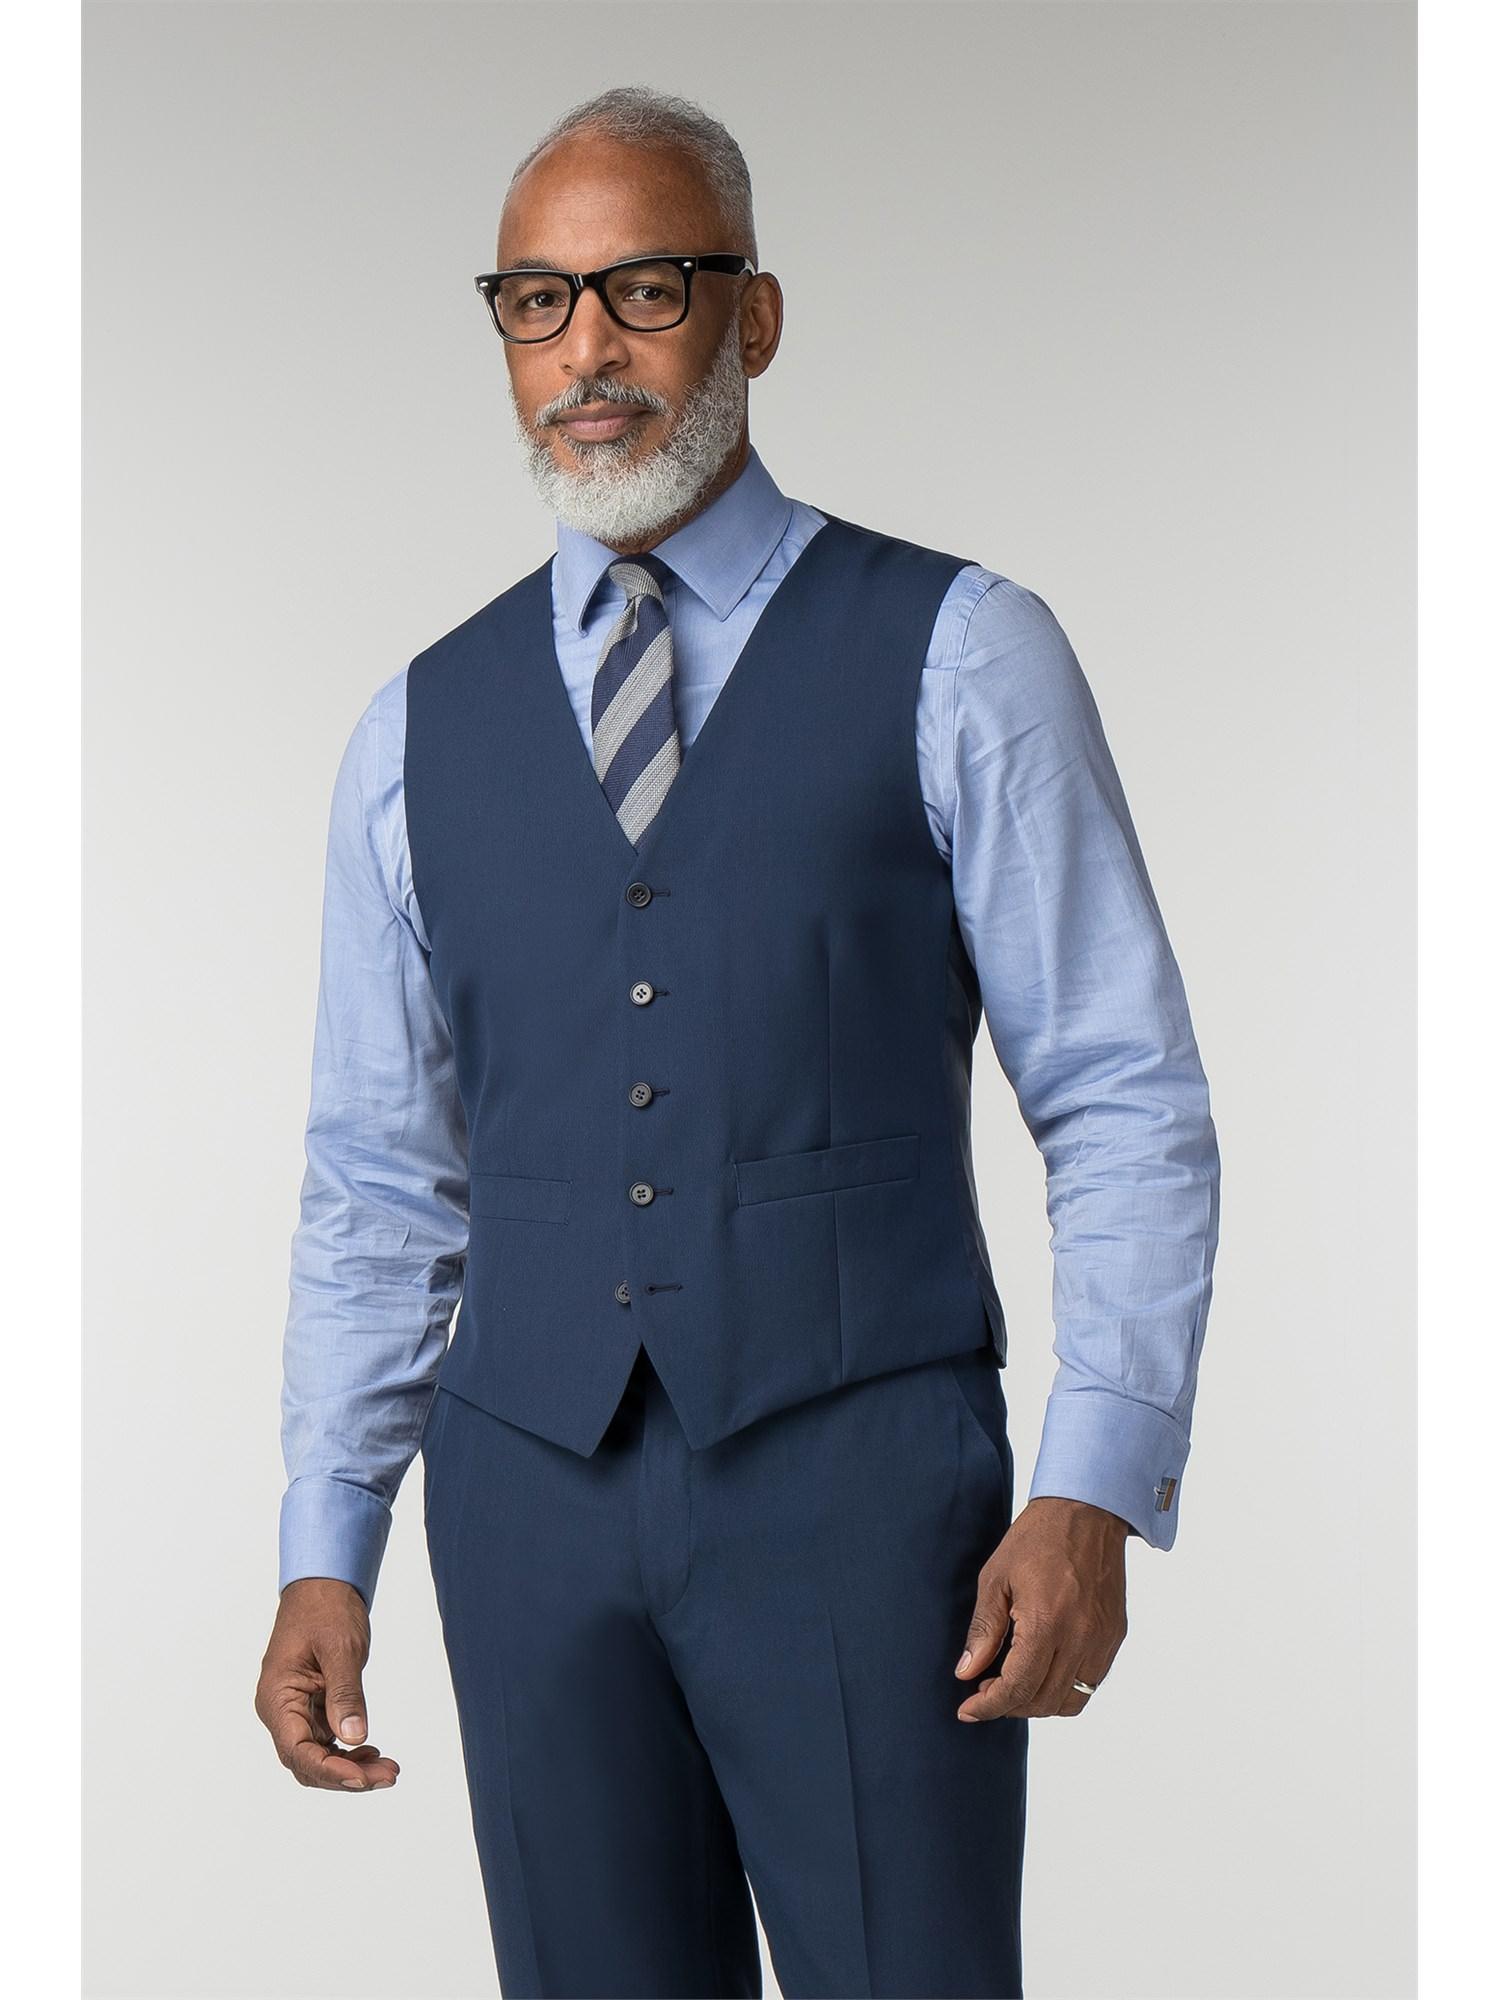 89341d5cd69 Scott Taylor Plain Blue Panama Regular Fit Waistcoat 38R Blue